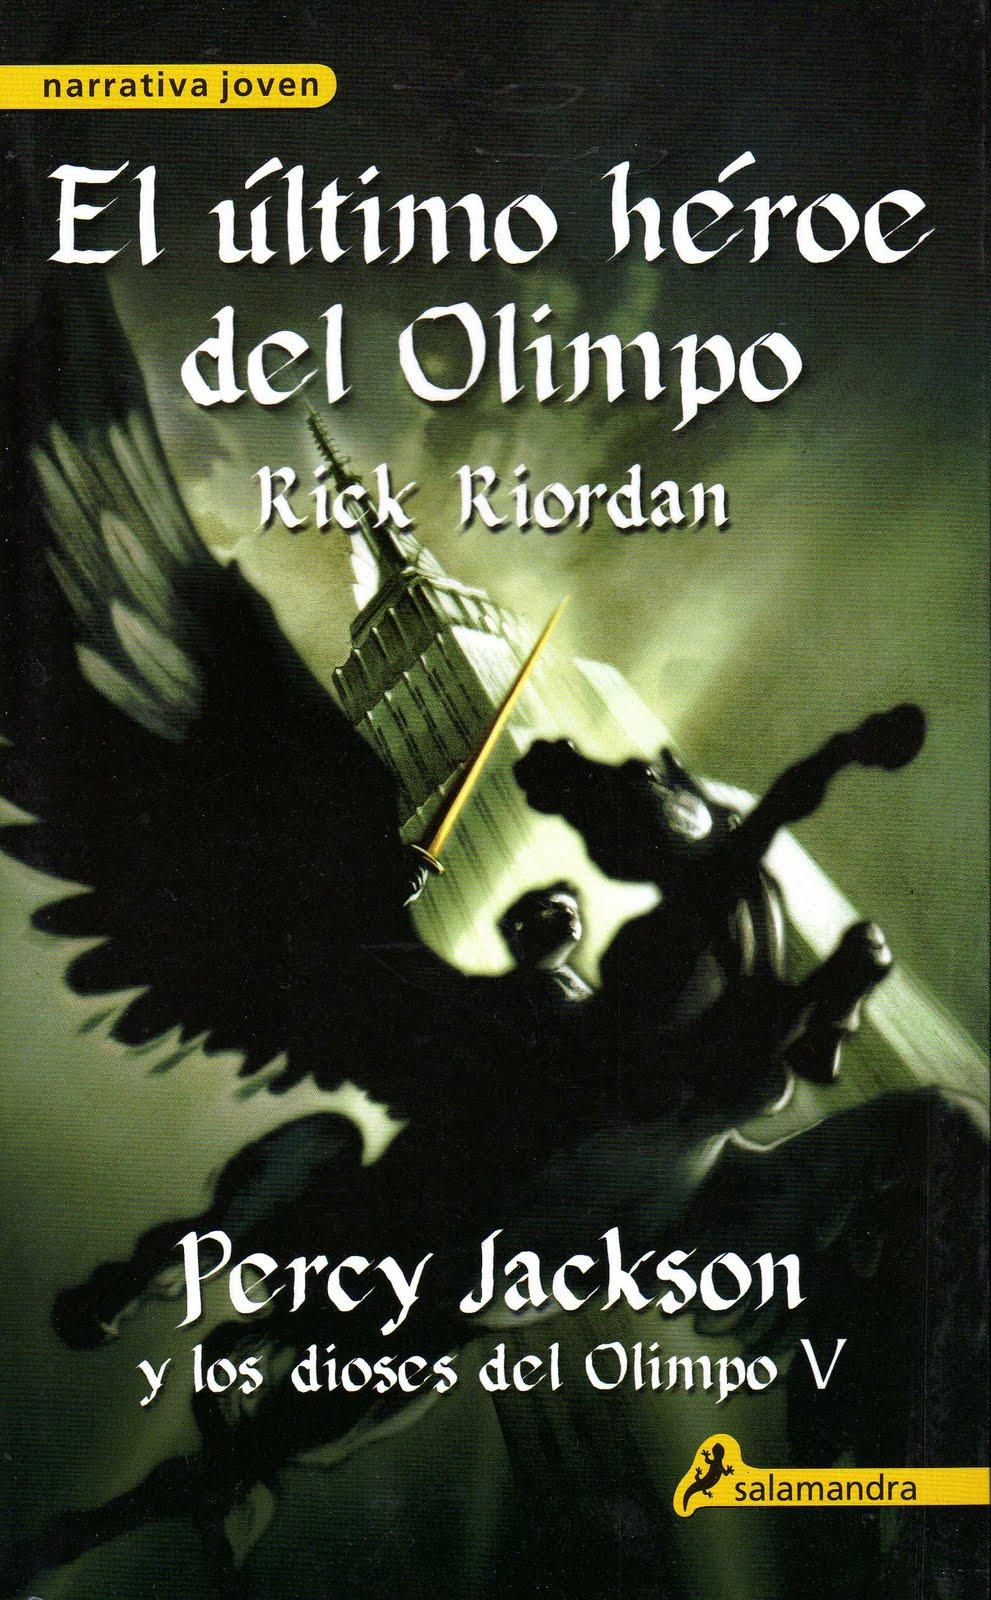 http://boligrafosinduenio.blogspot.com/2014/02/el-ultimo-heroe-del-olimpo-resena.html